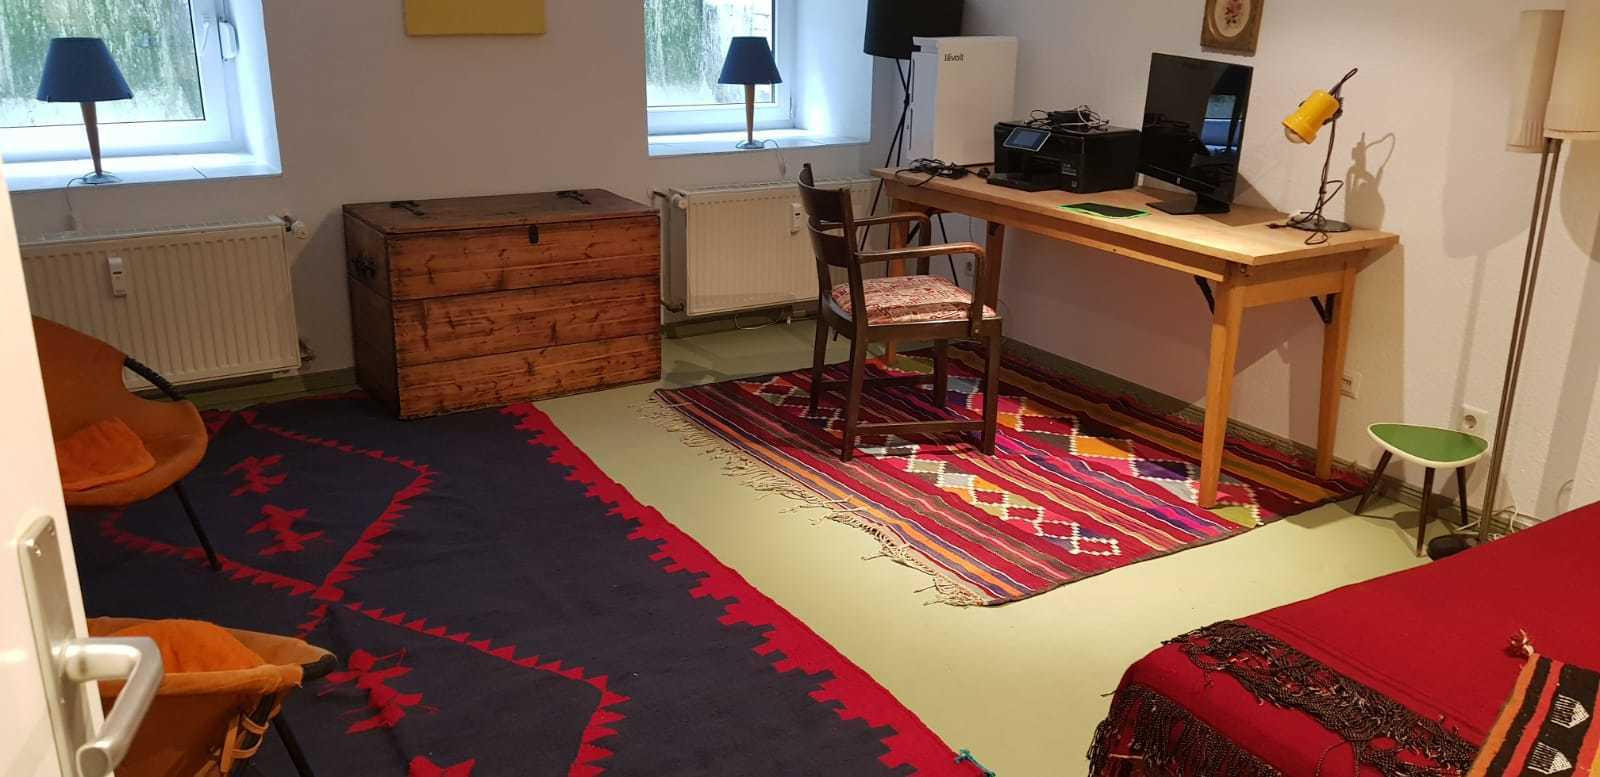 Berlin  Galerie Studio 10437 - Sou-Terrain image 4